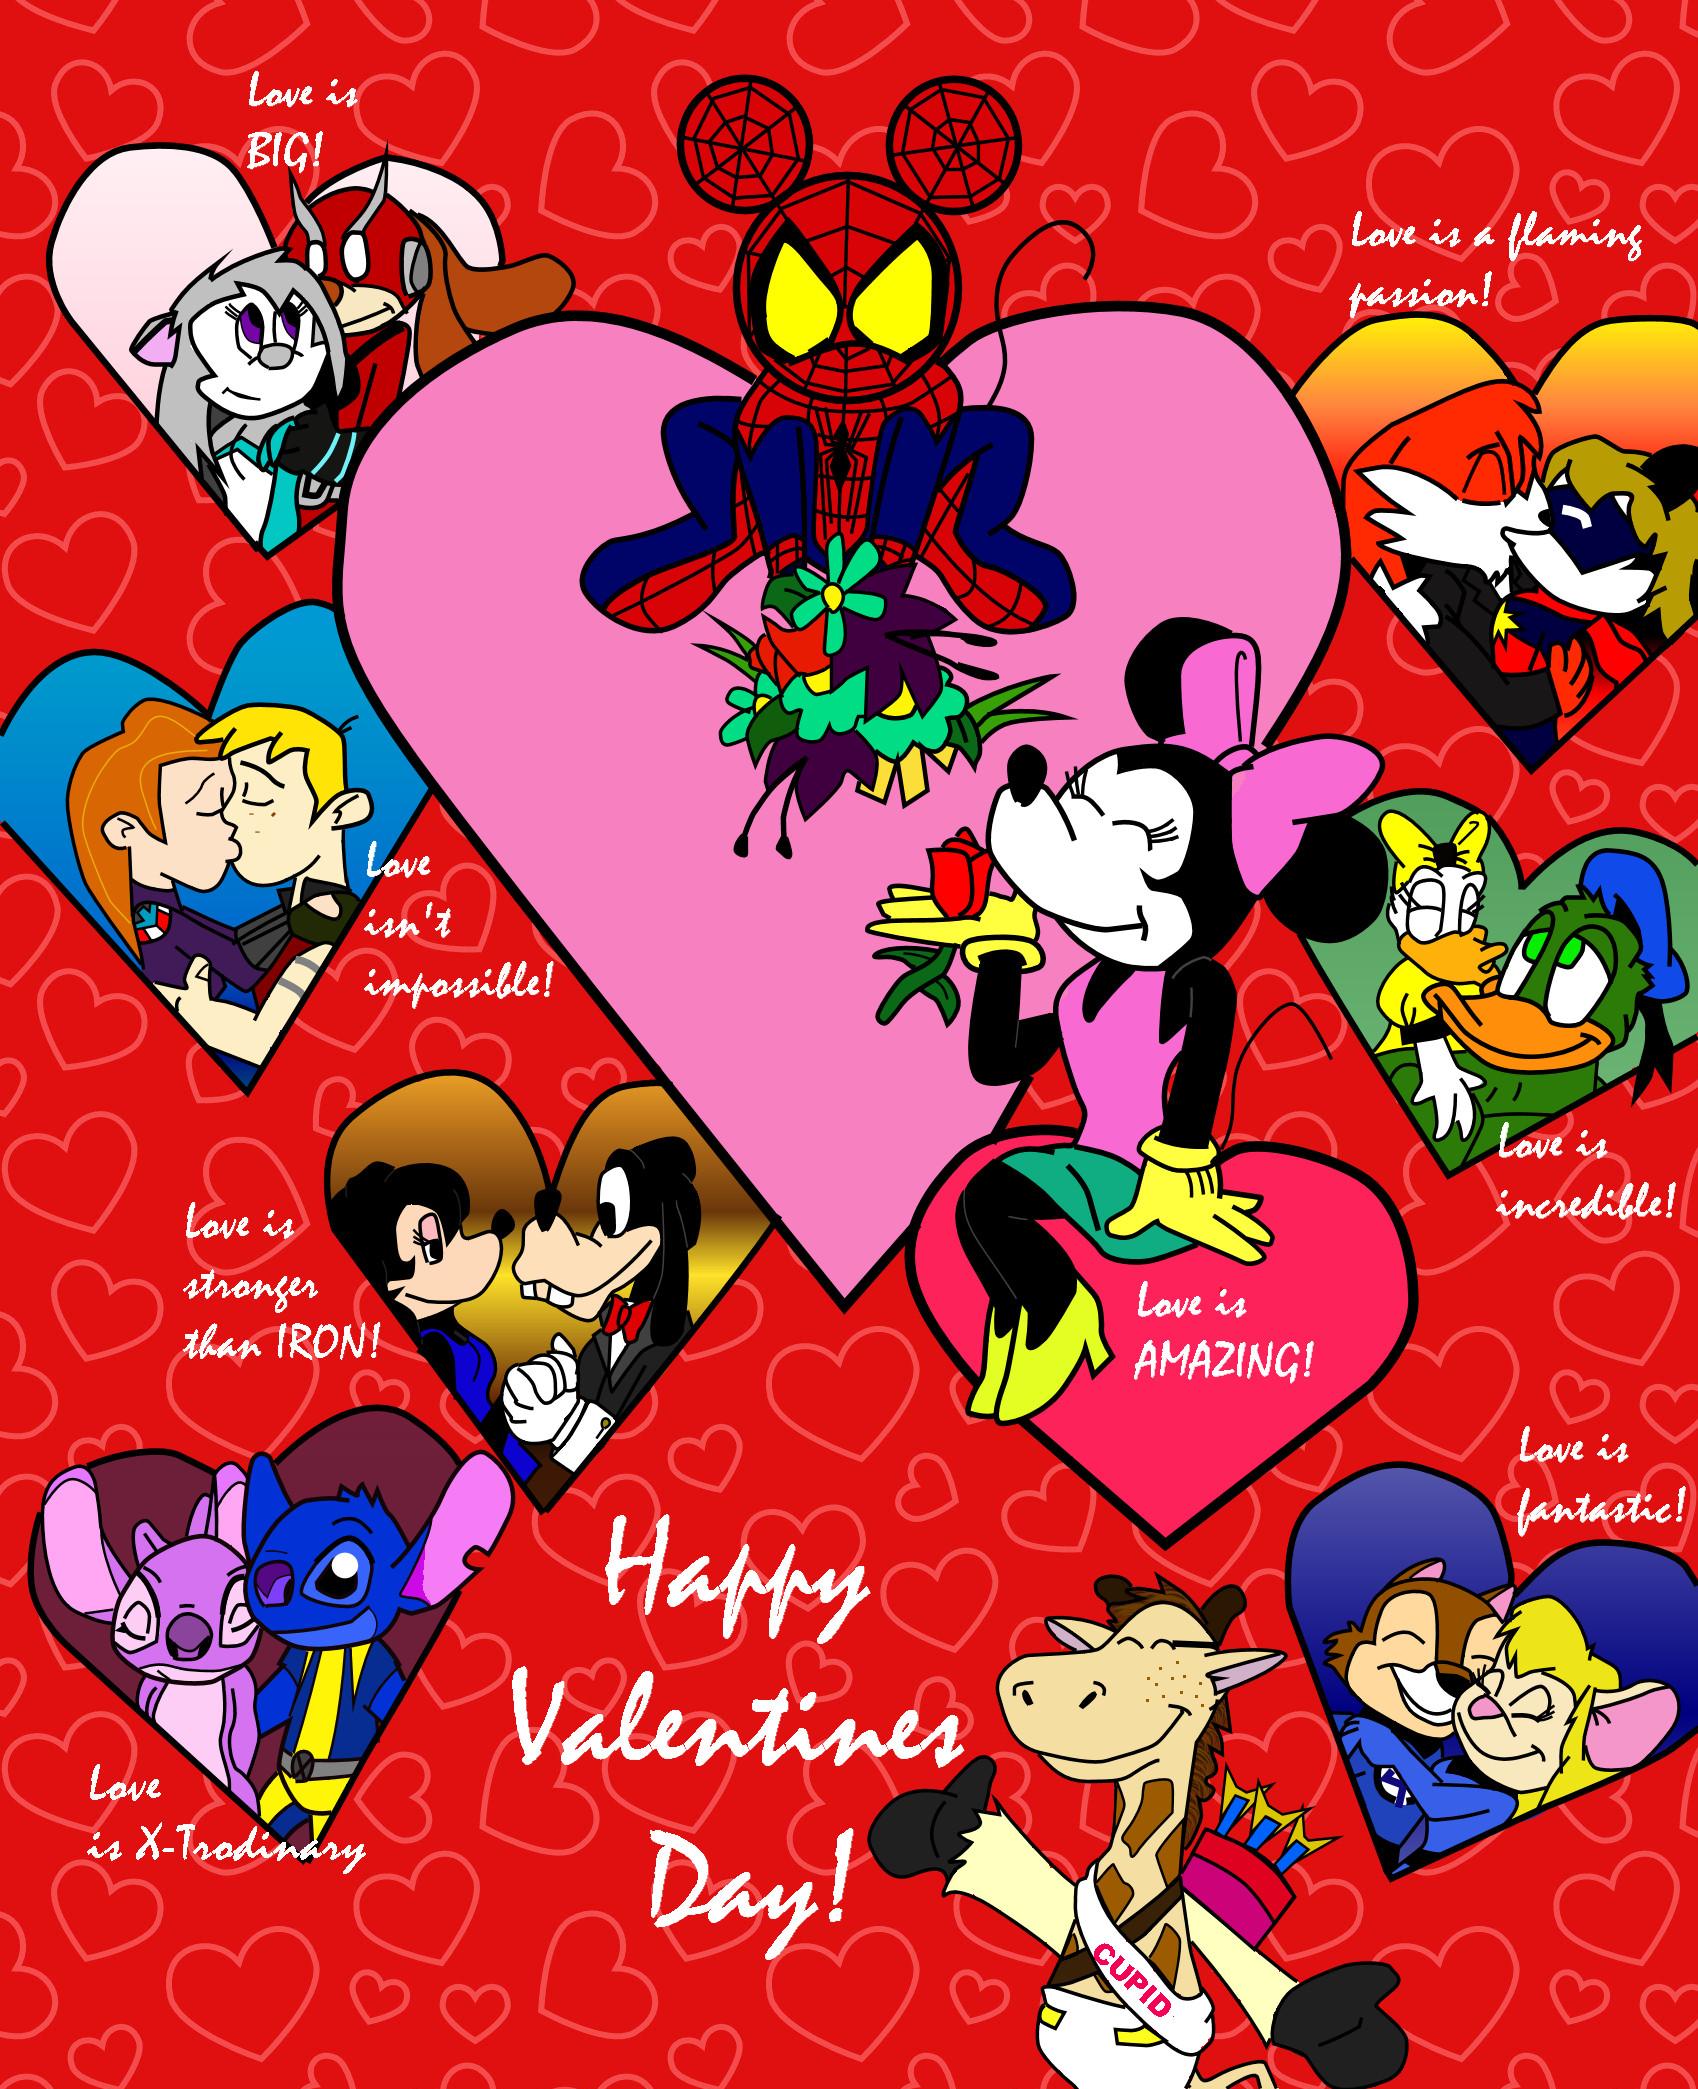 Disney Valentines Wallpaper Disney valenti 1698x2089